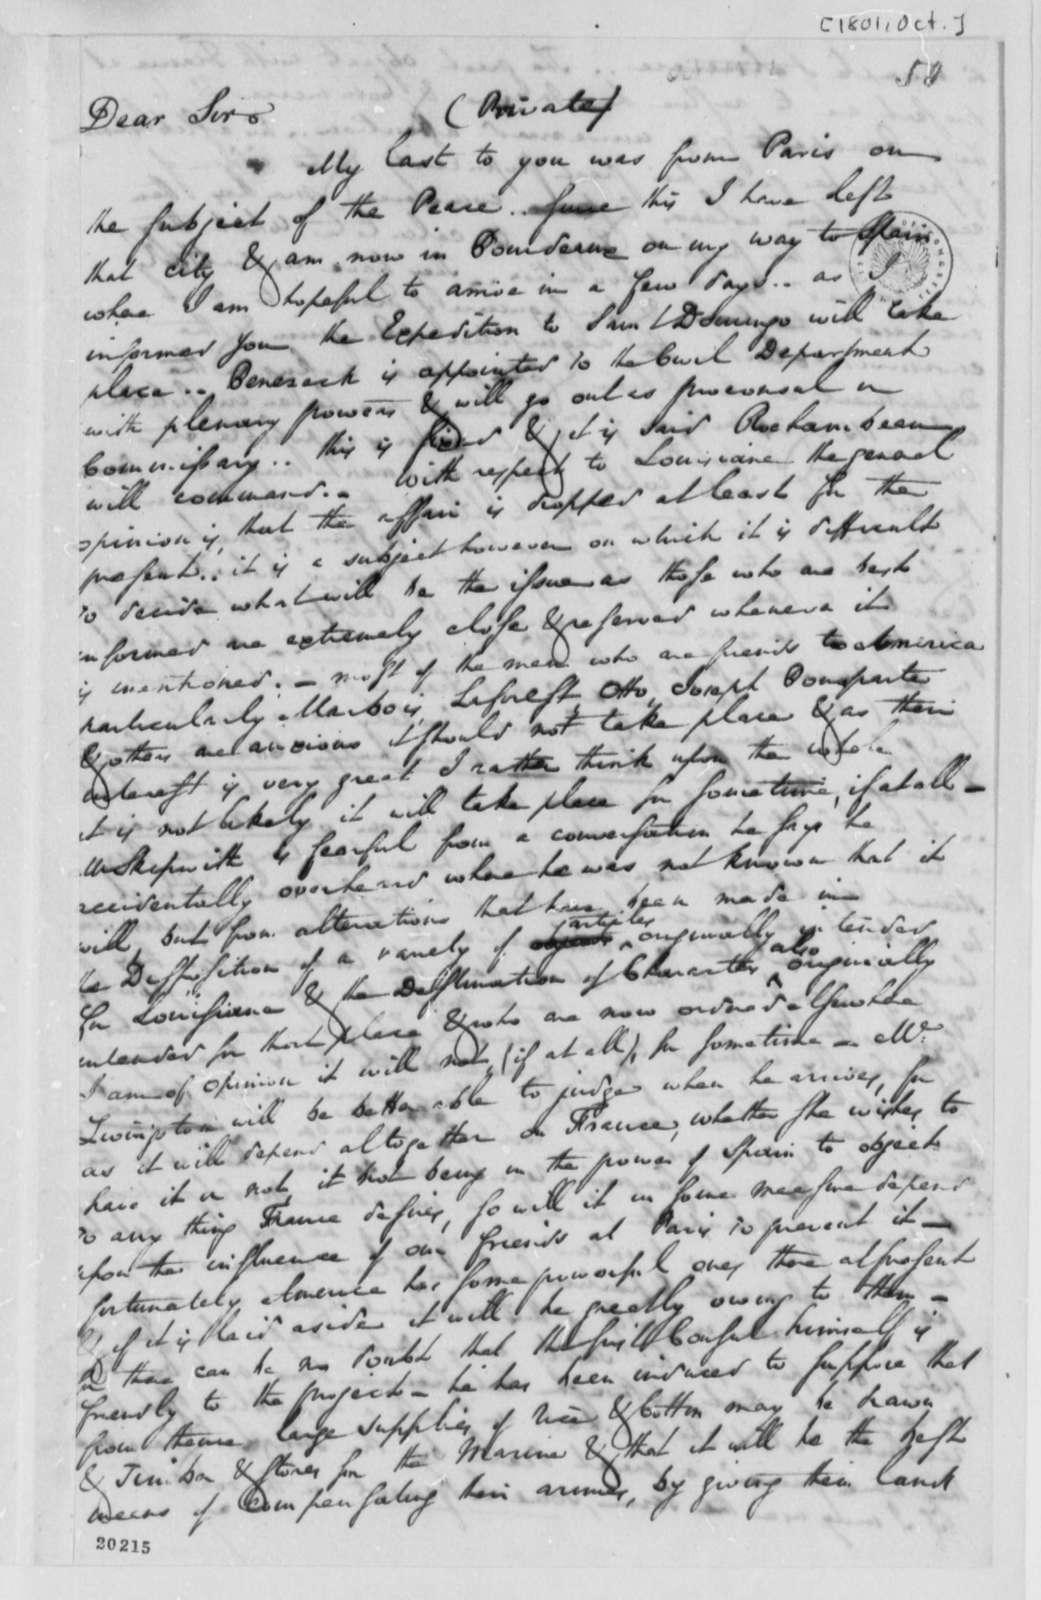 Charles Pinckney to Thomas Jefferson, October 1801